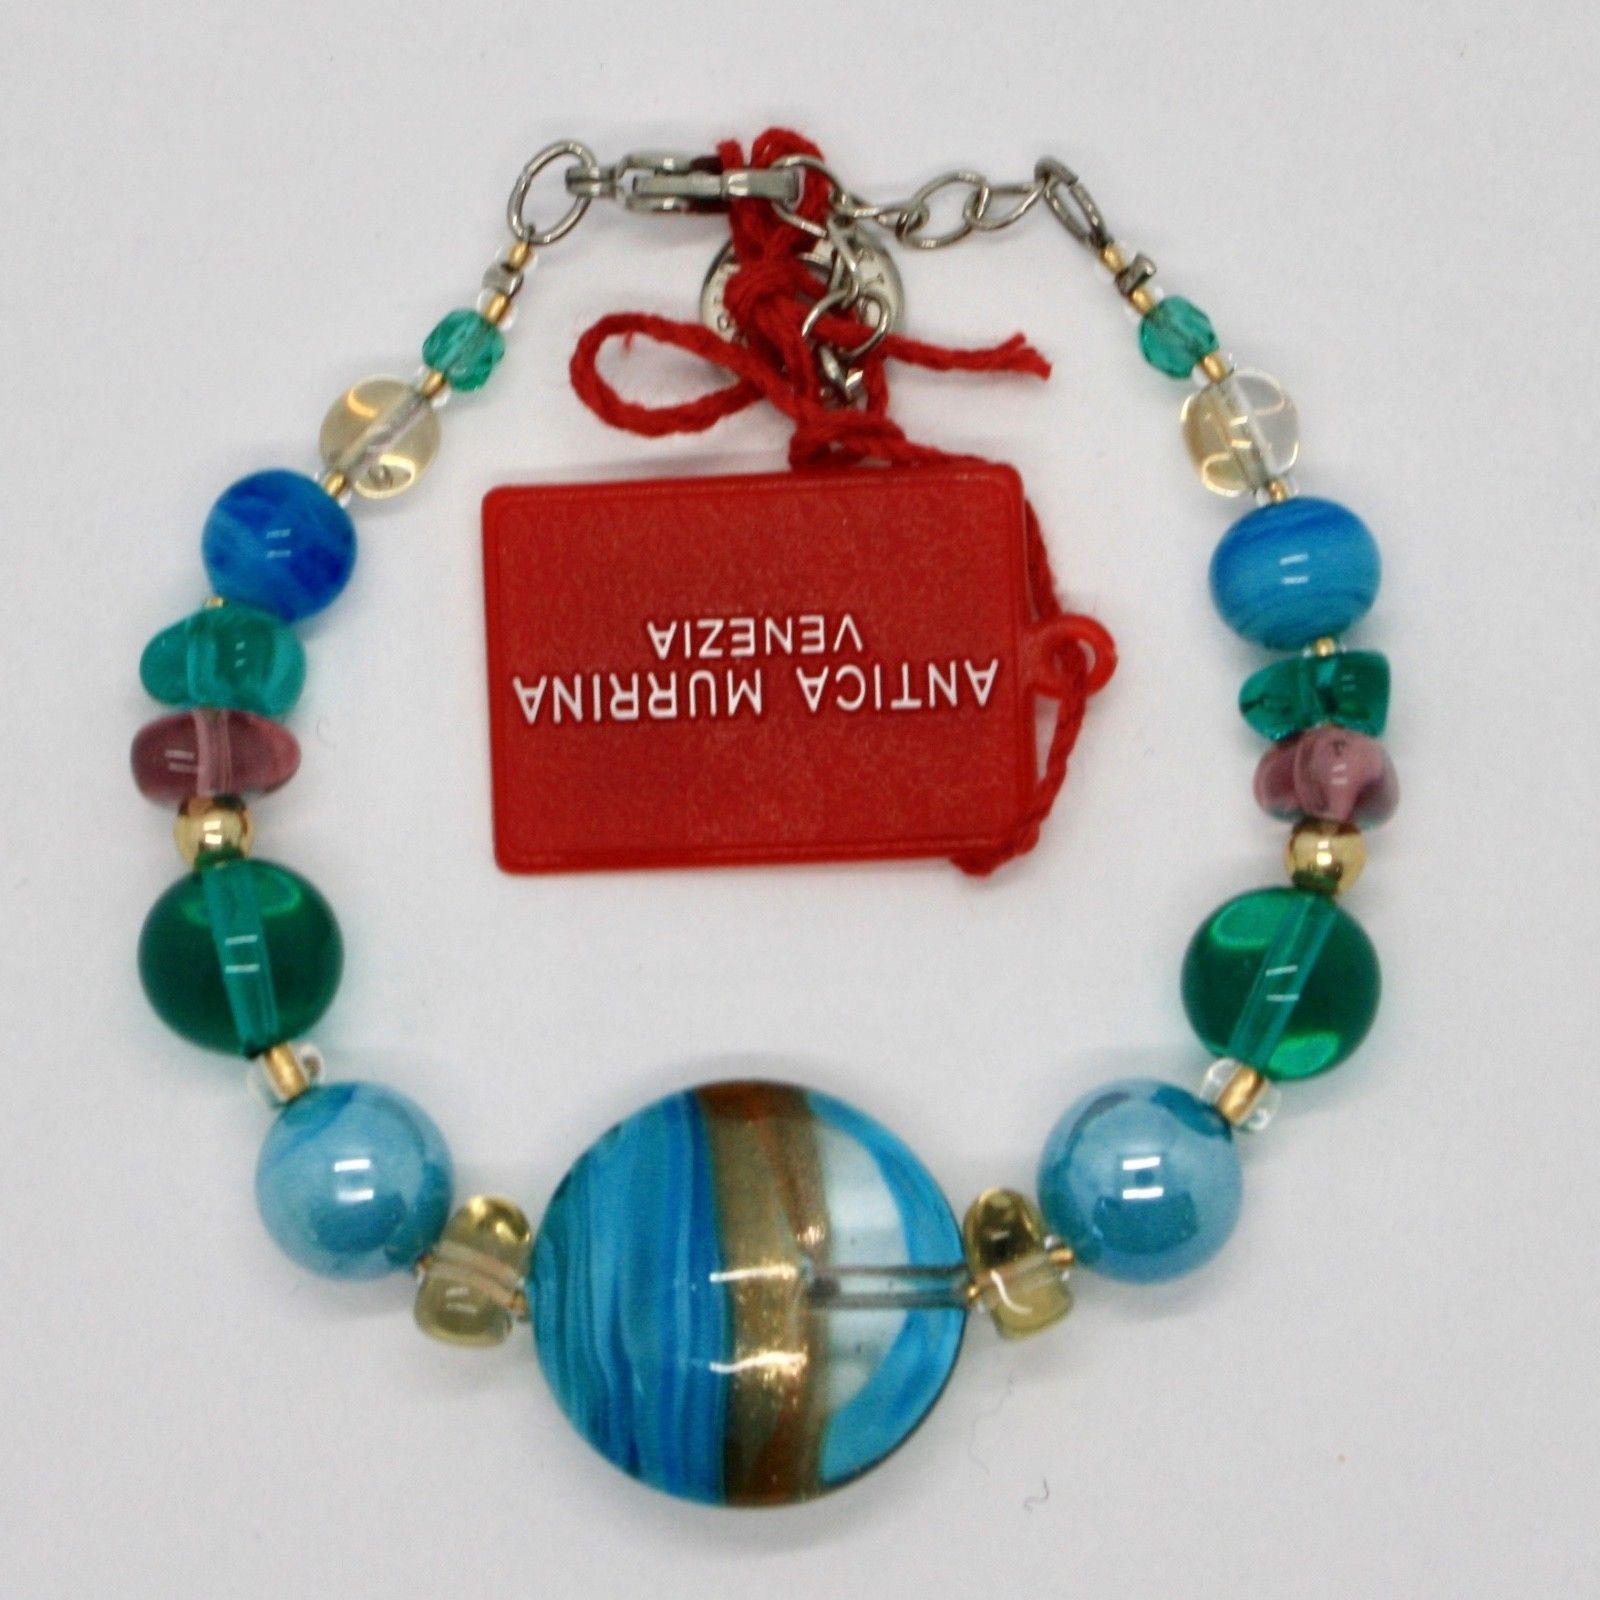 BRACELET ANTICA MURRINA VENEZIA, MURANO GLASS YELLOW BLUE TURQUOISE BR761A07